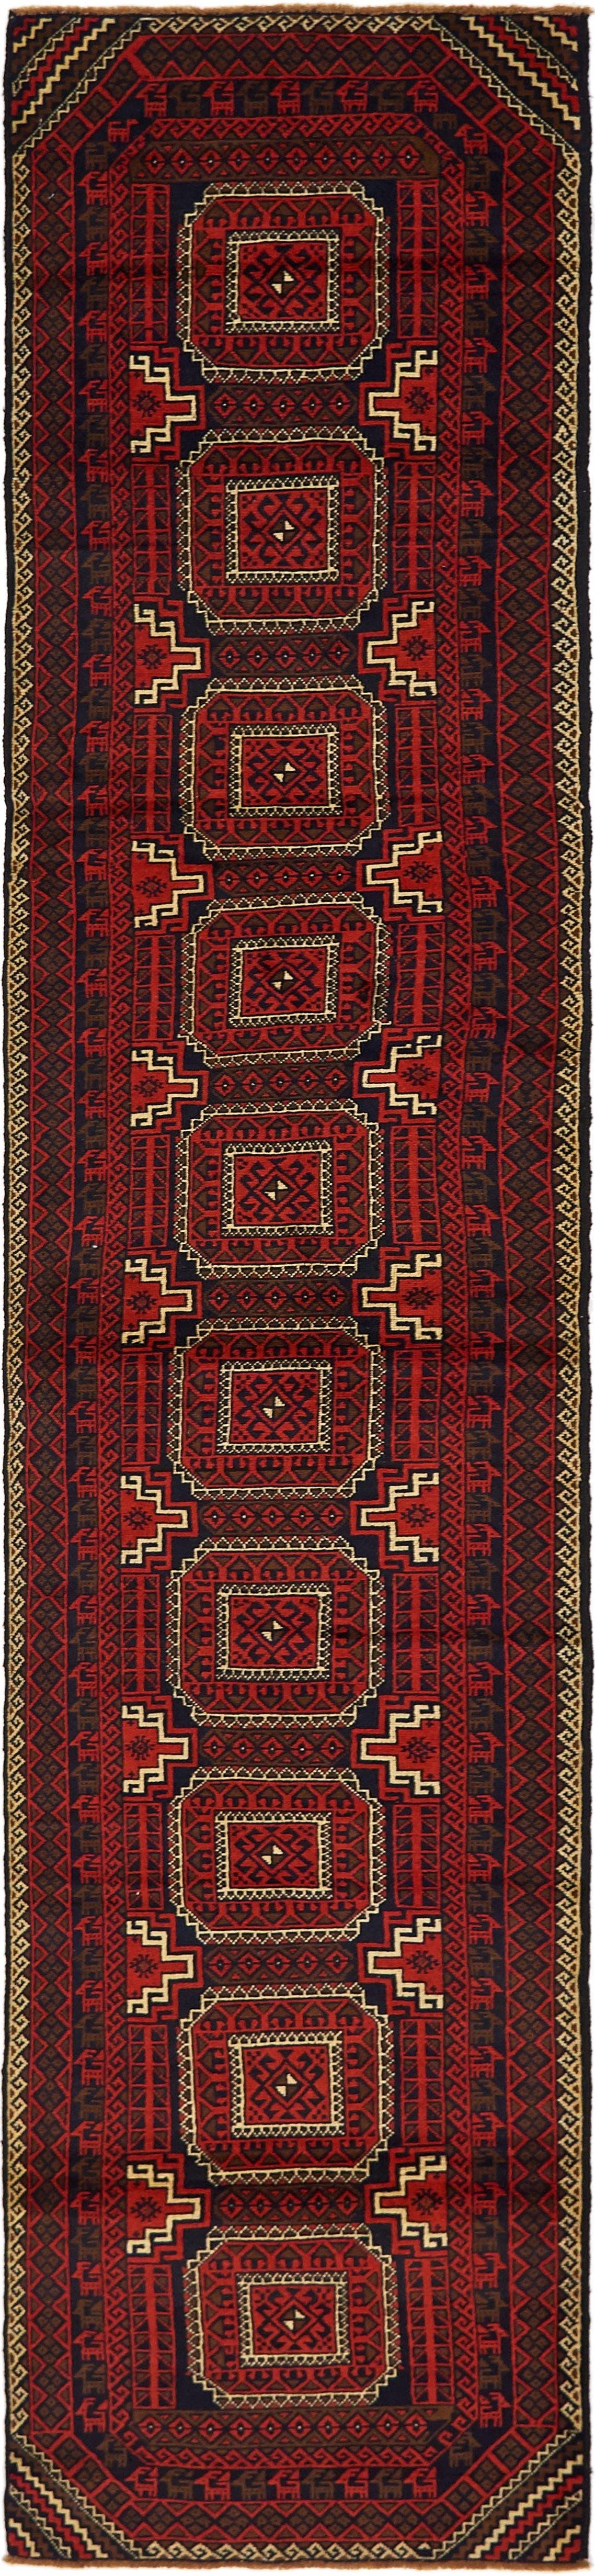 2' 7 x 12' 4 Balouch Persian Runner Rug main image